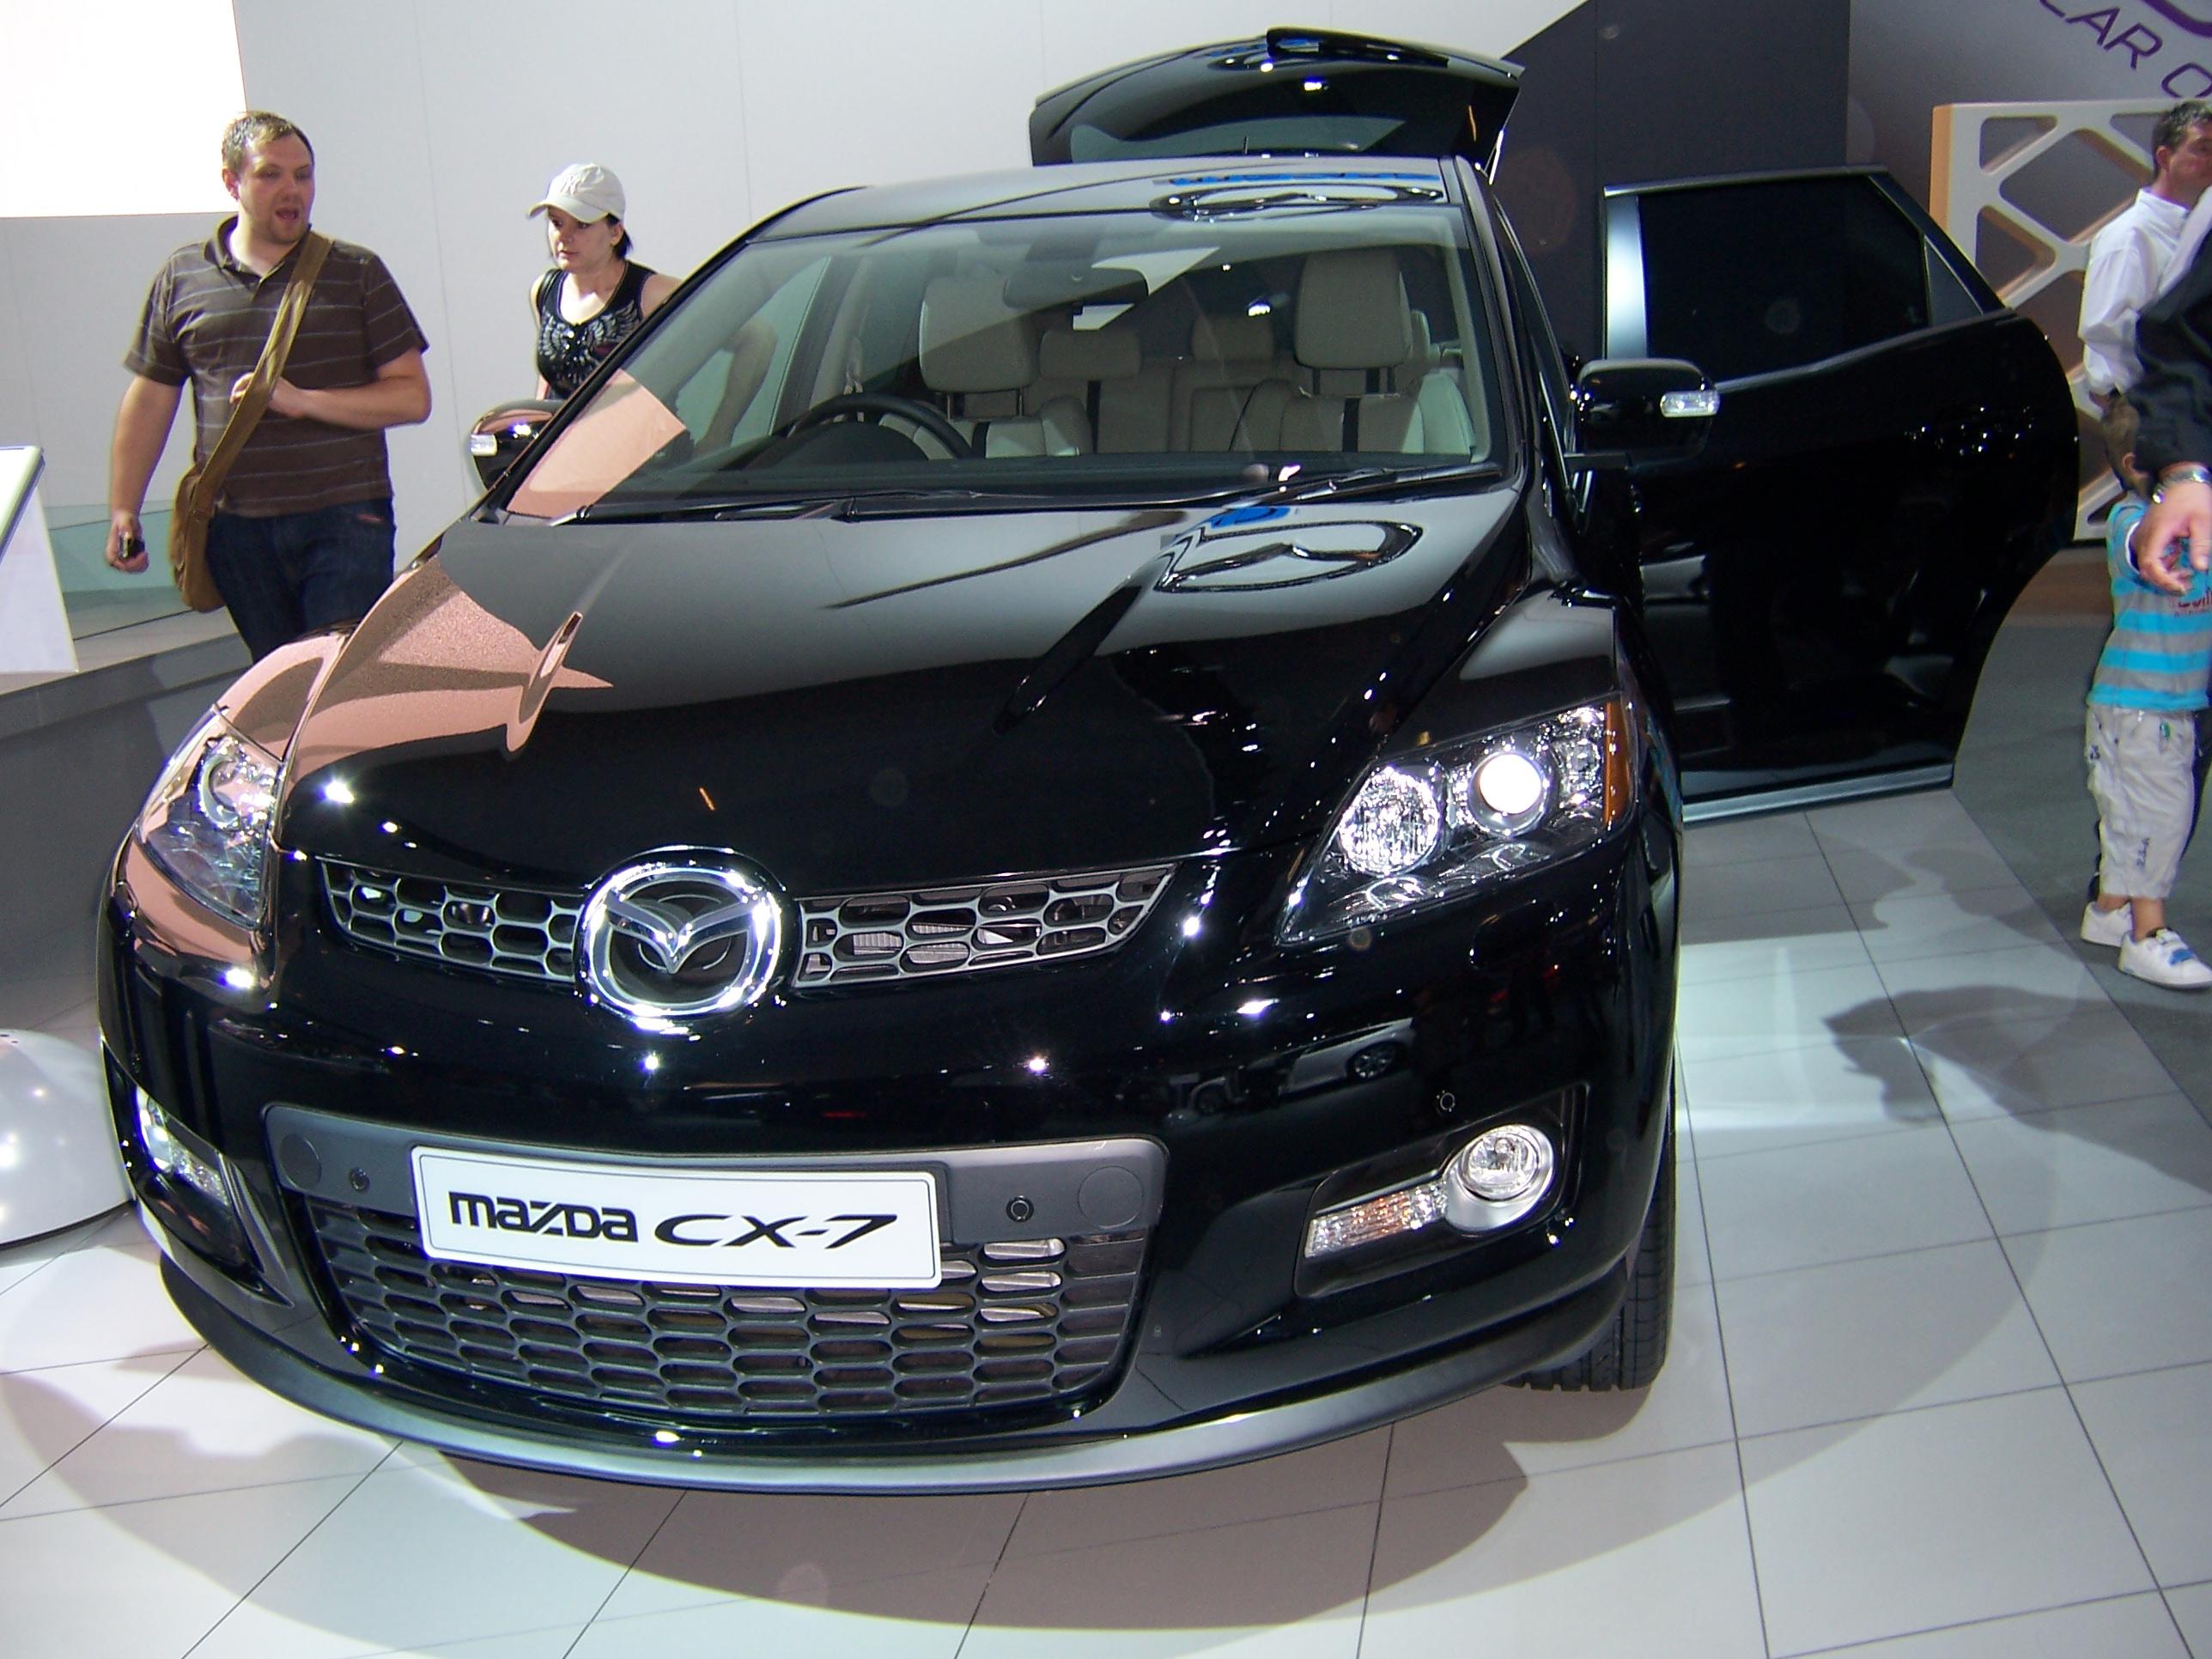 File:Mazda CX 7   Flickr   Alan D